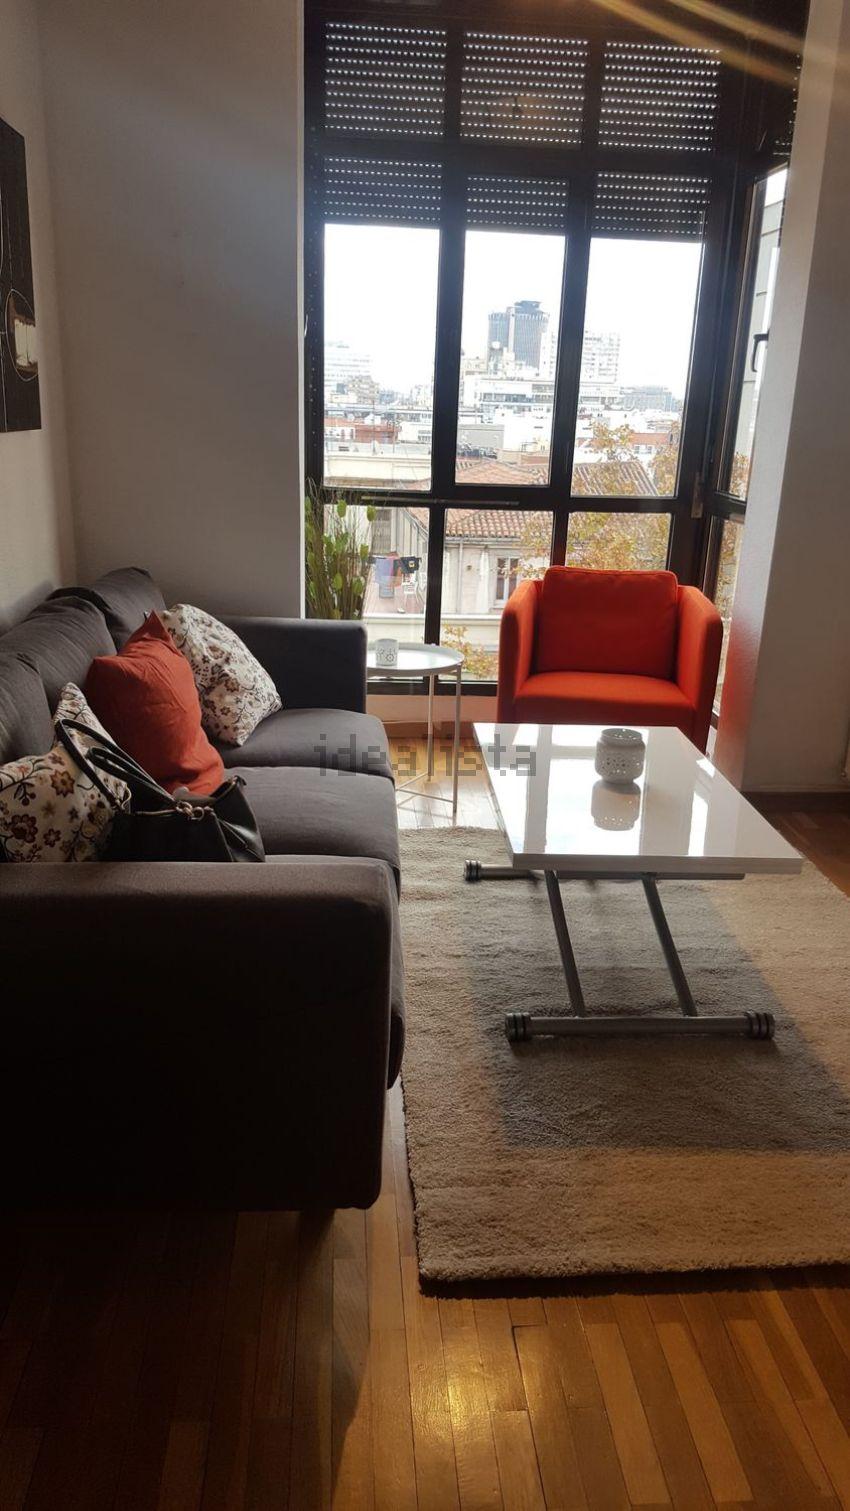 Estudio en calle de Bravo Murillo, 193, Berruguete, Madrid